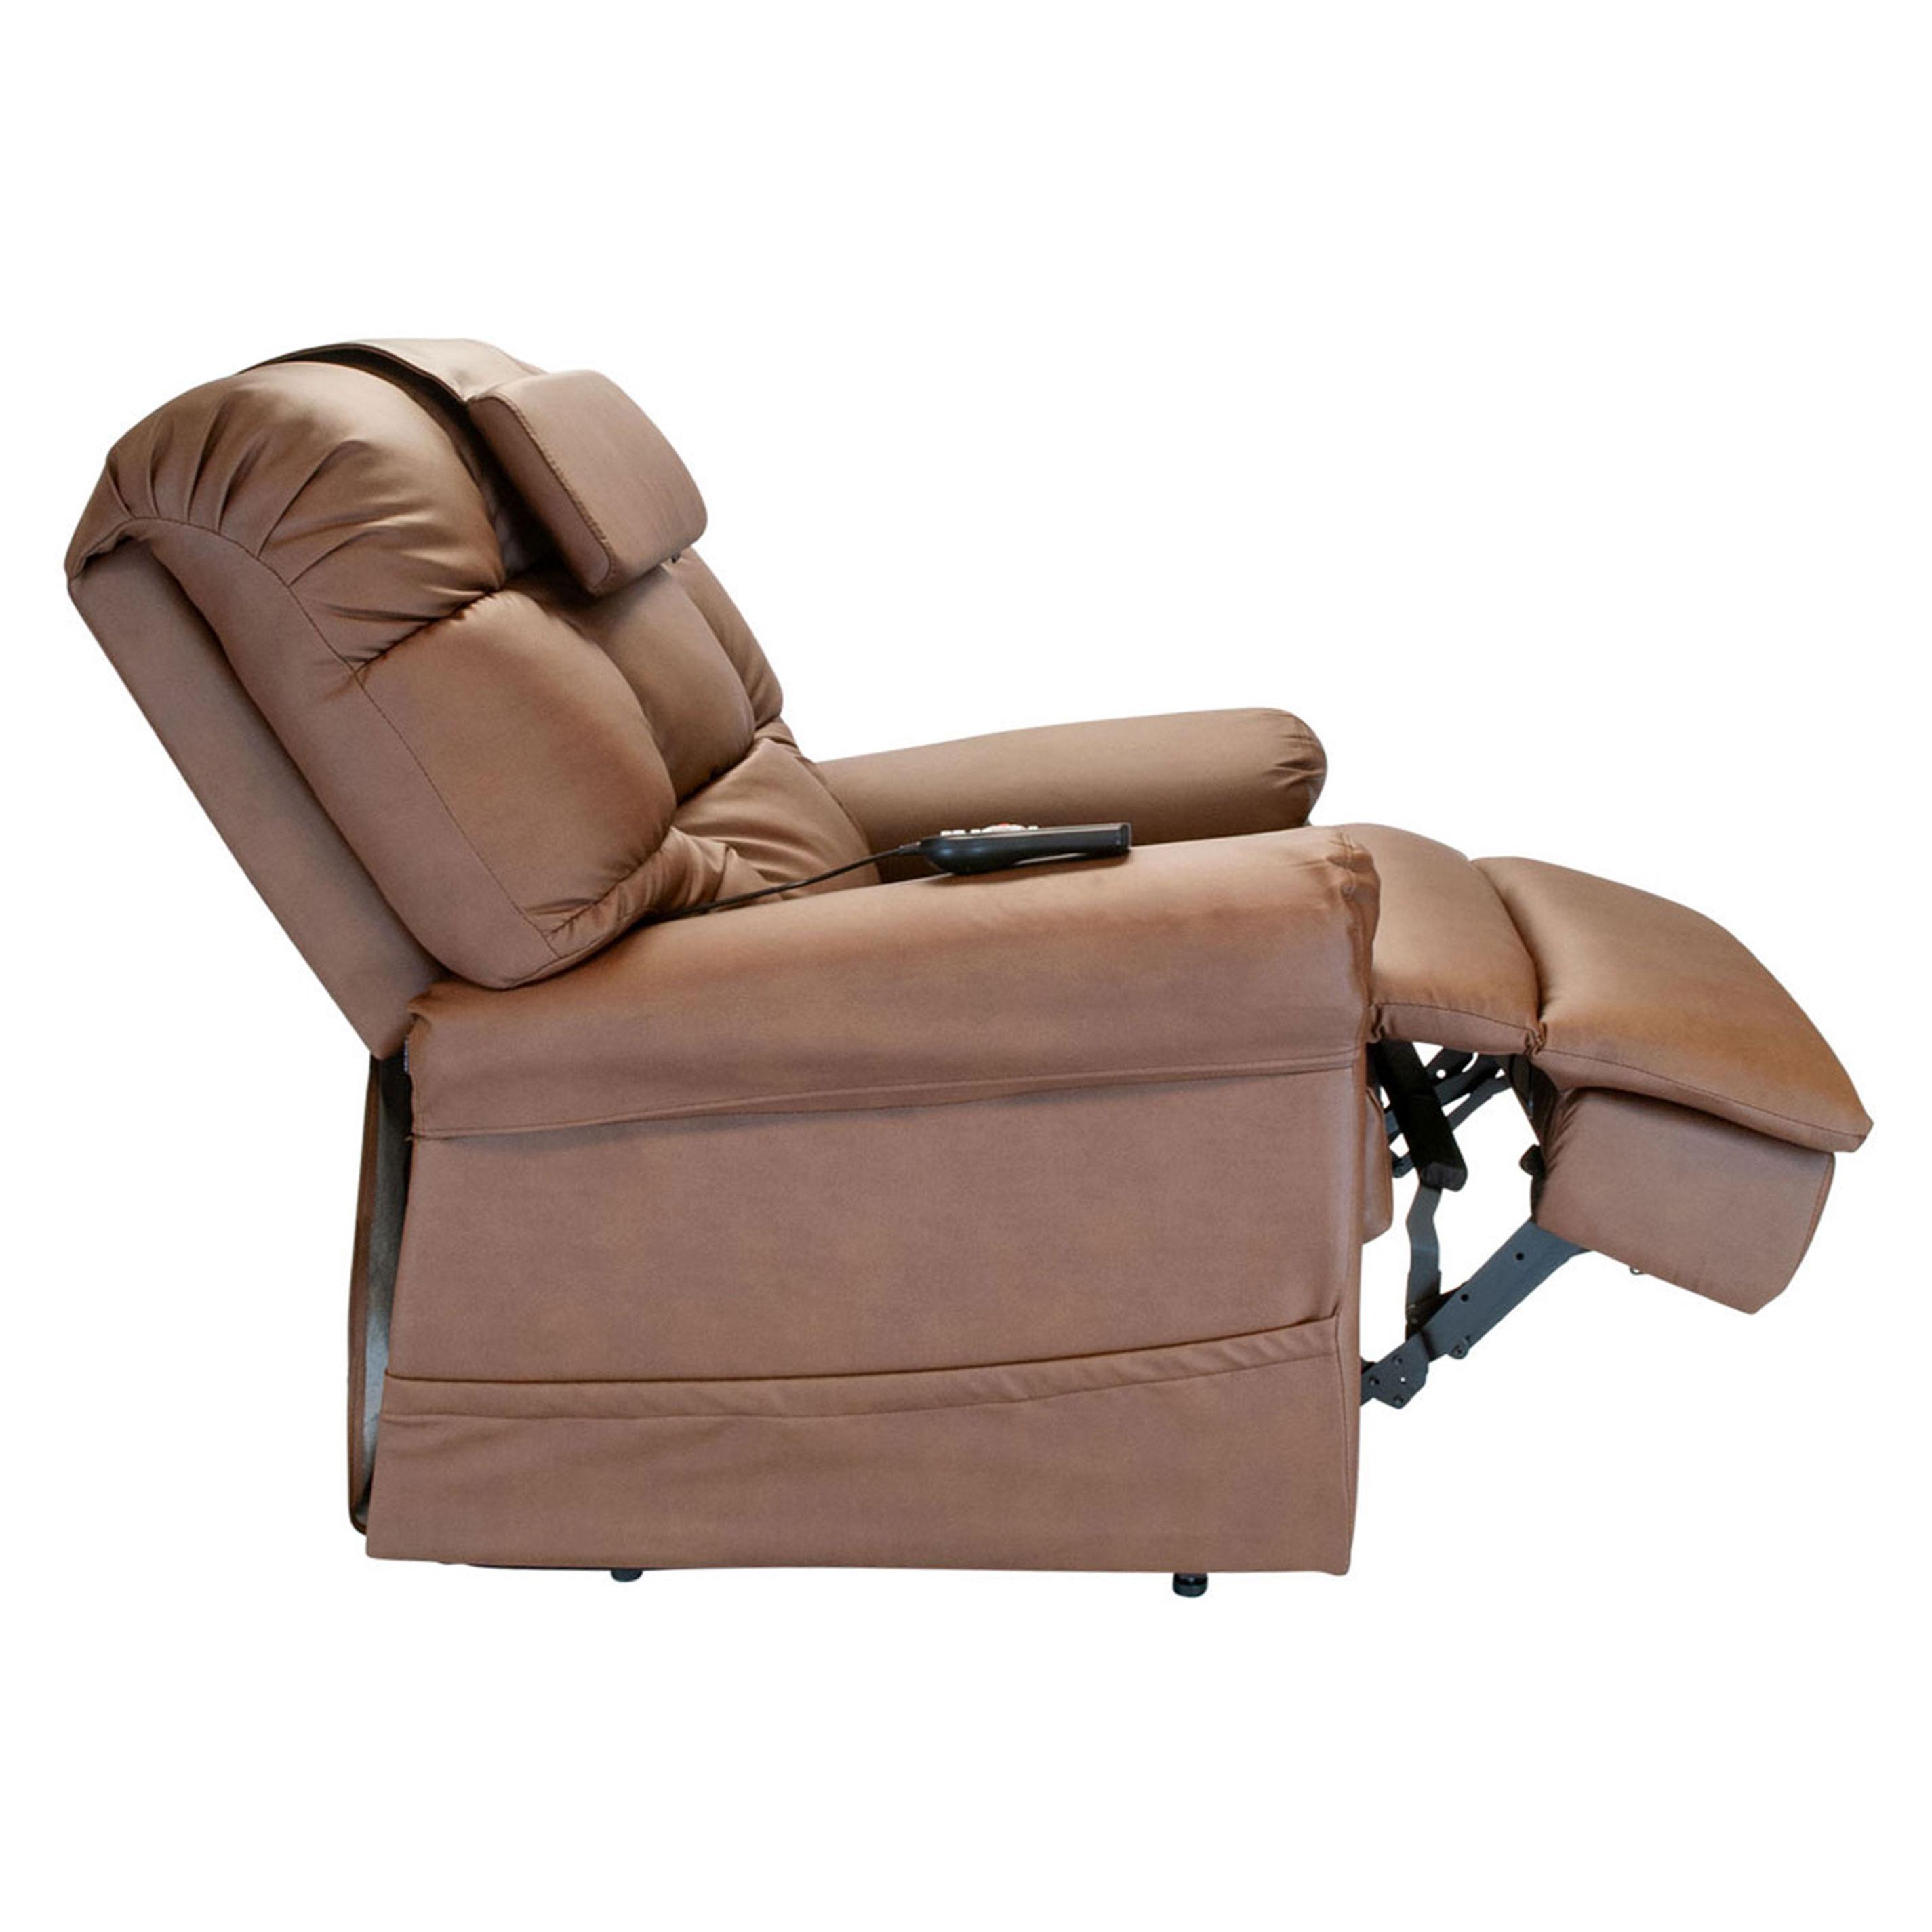 Miraculous Wiselift 450 Sleeper Lift Chair Recliner Mocha Enduralux Leather Machost Co Dining Chair Design Ideas Machostcouk